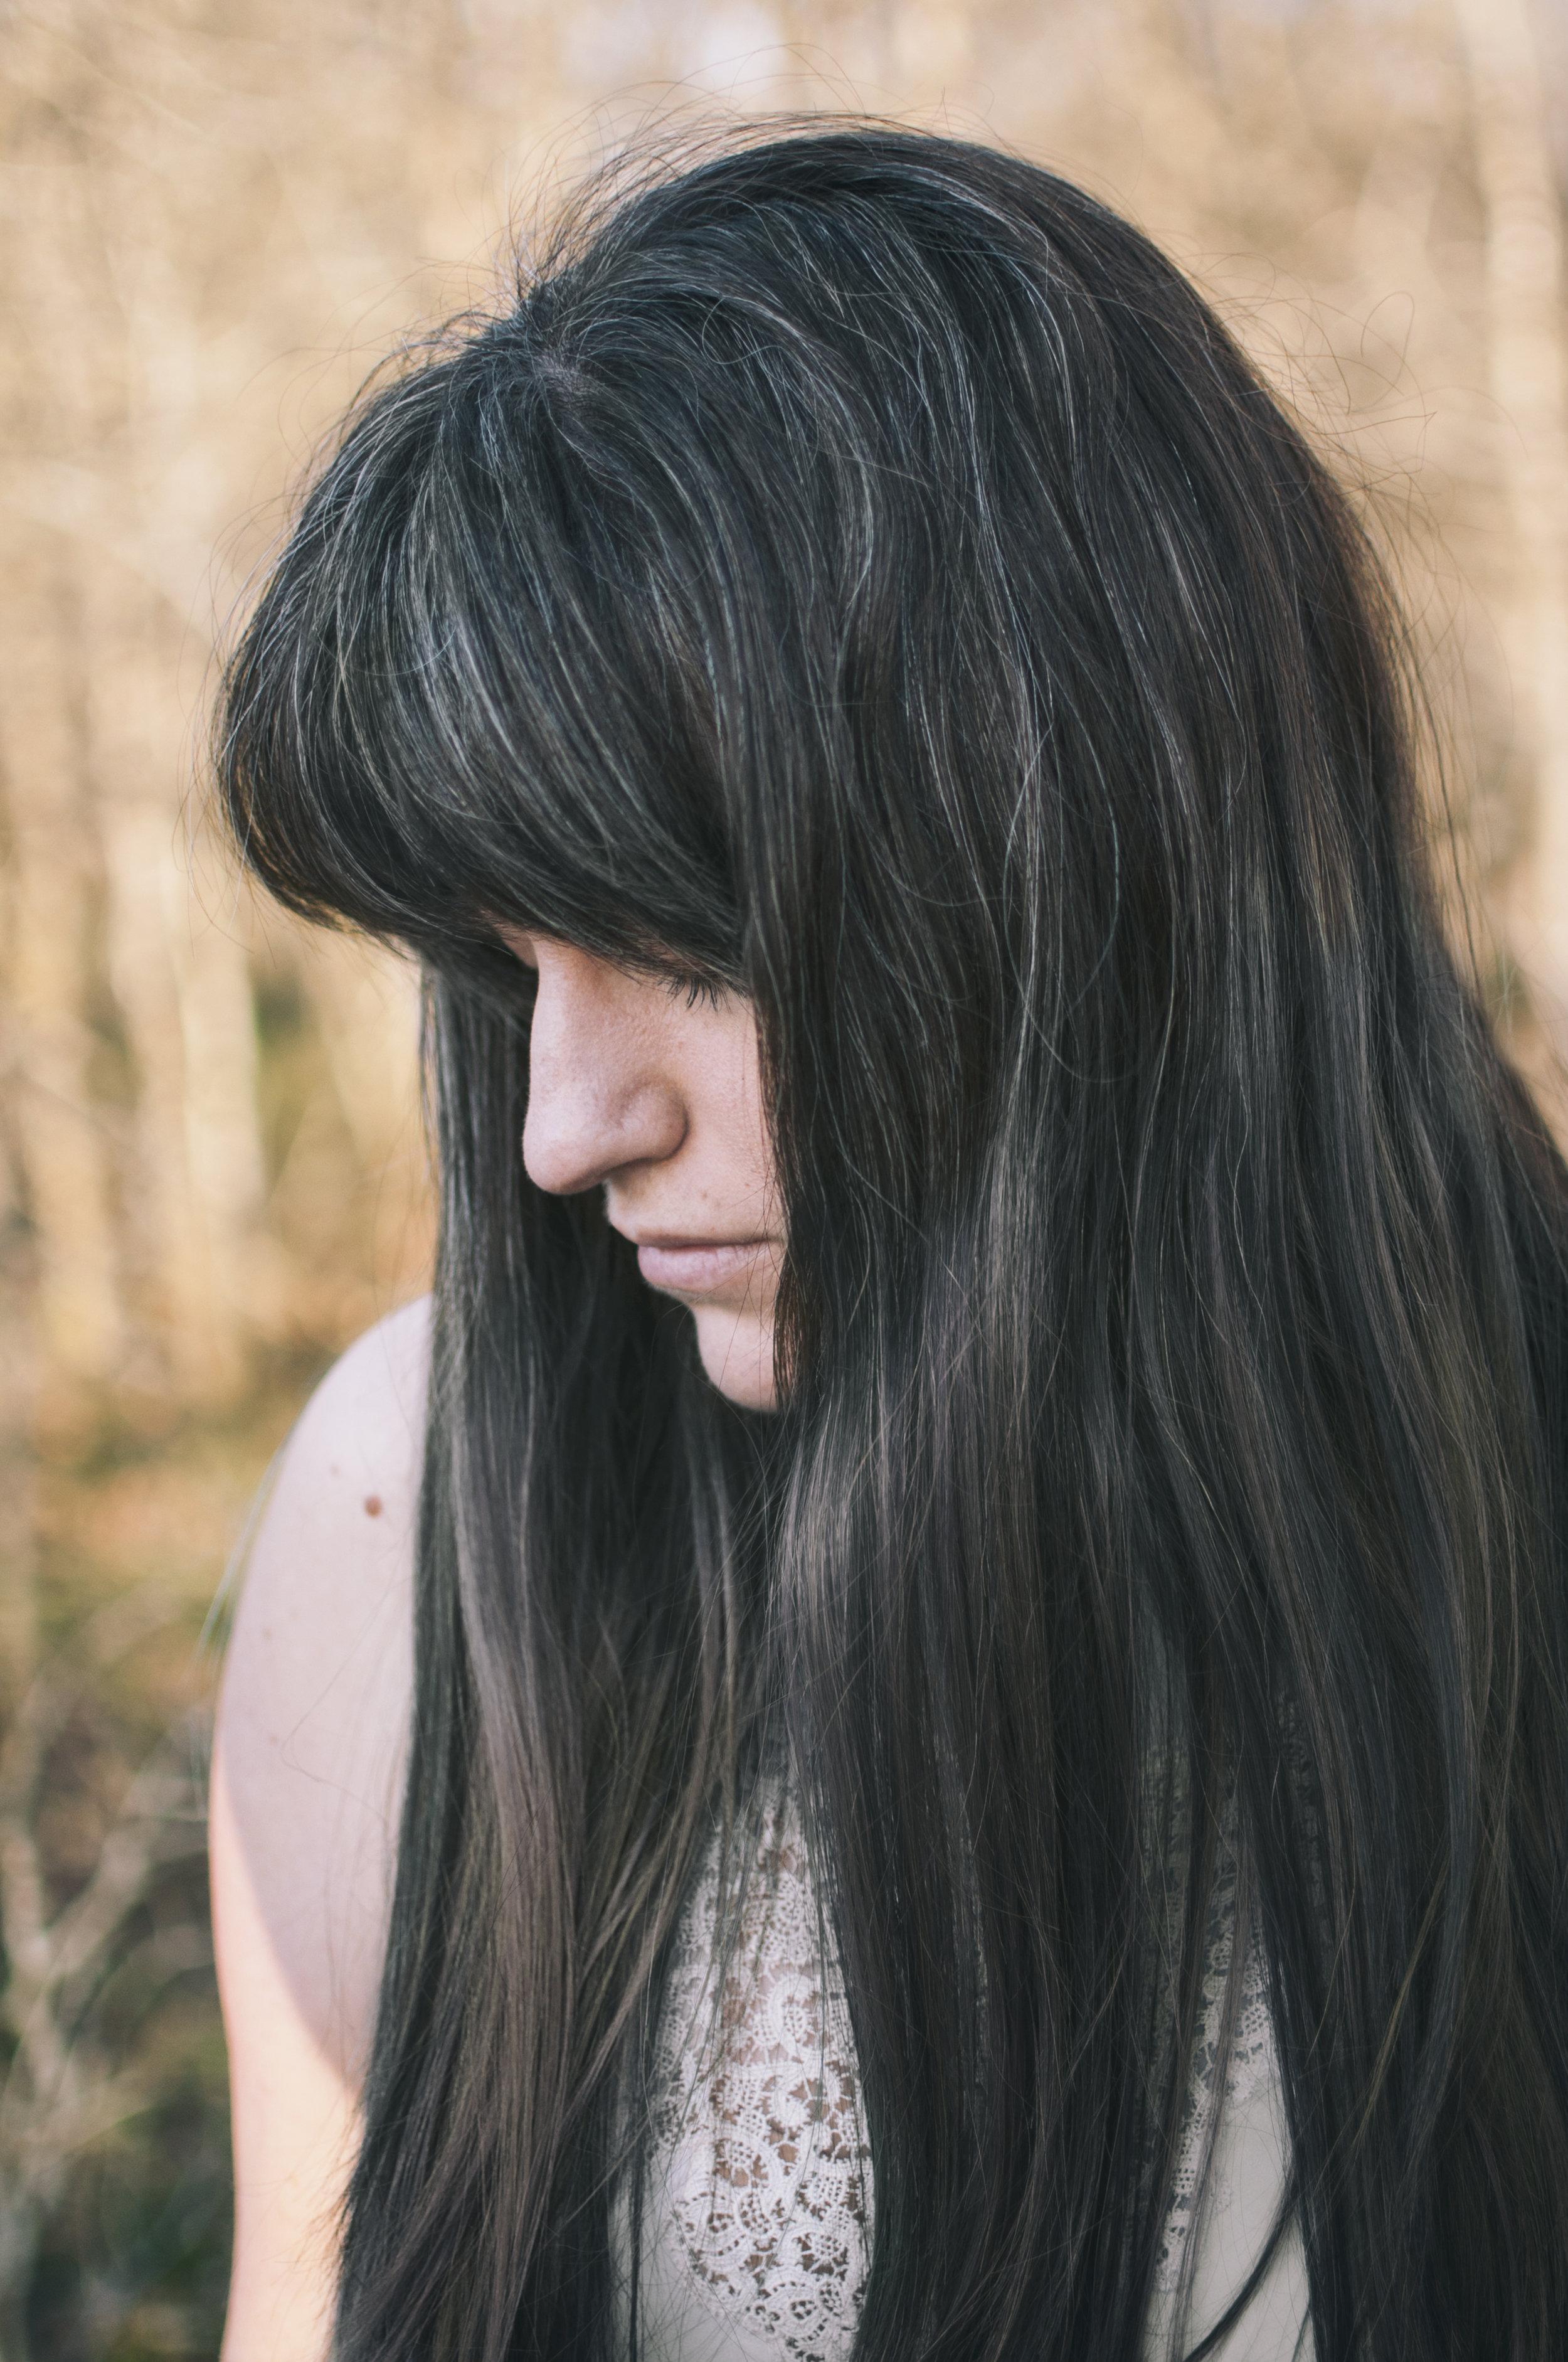 selfportrait_bust_profile01.jpg